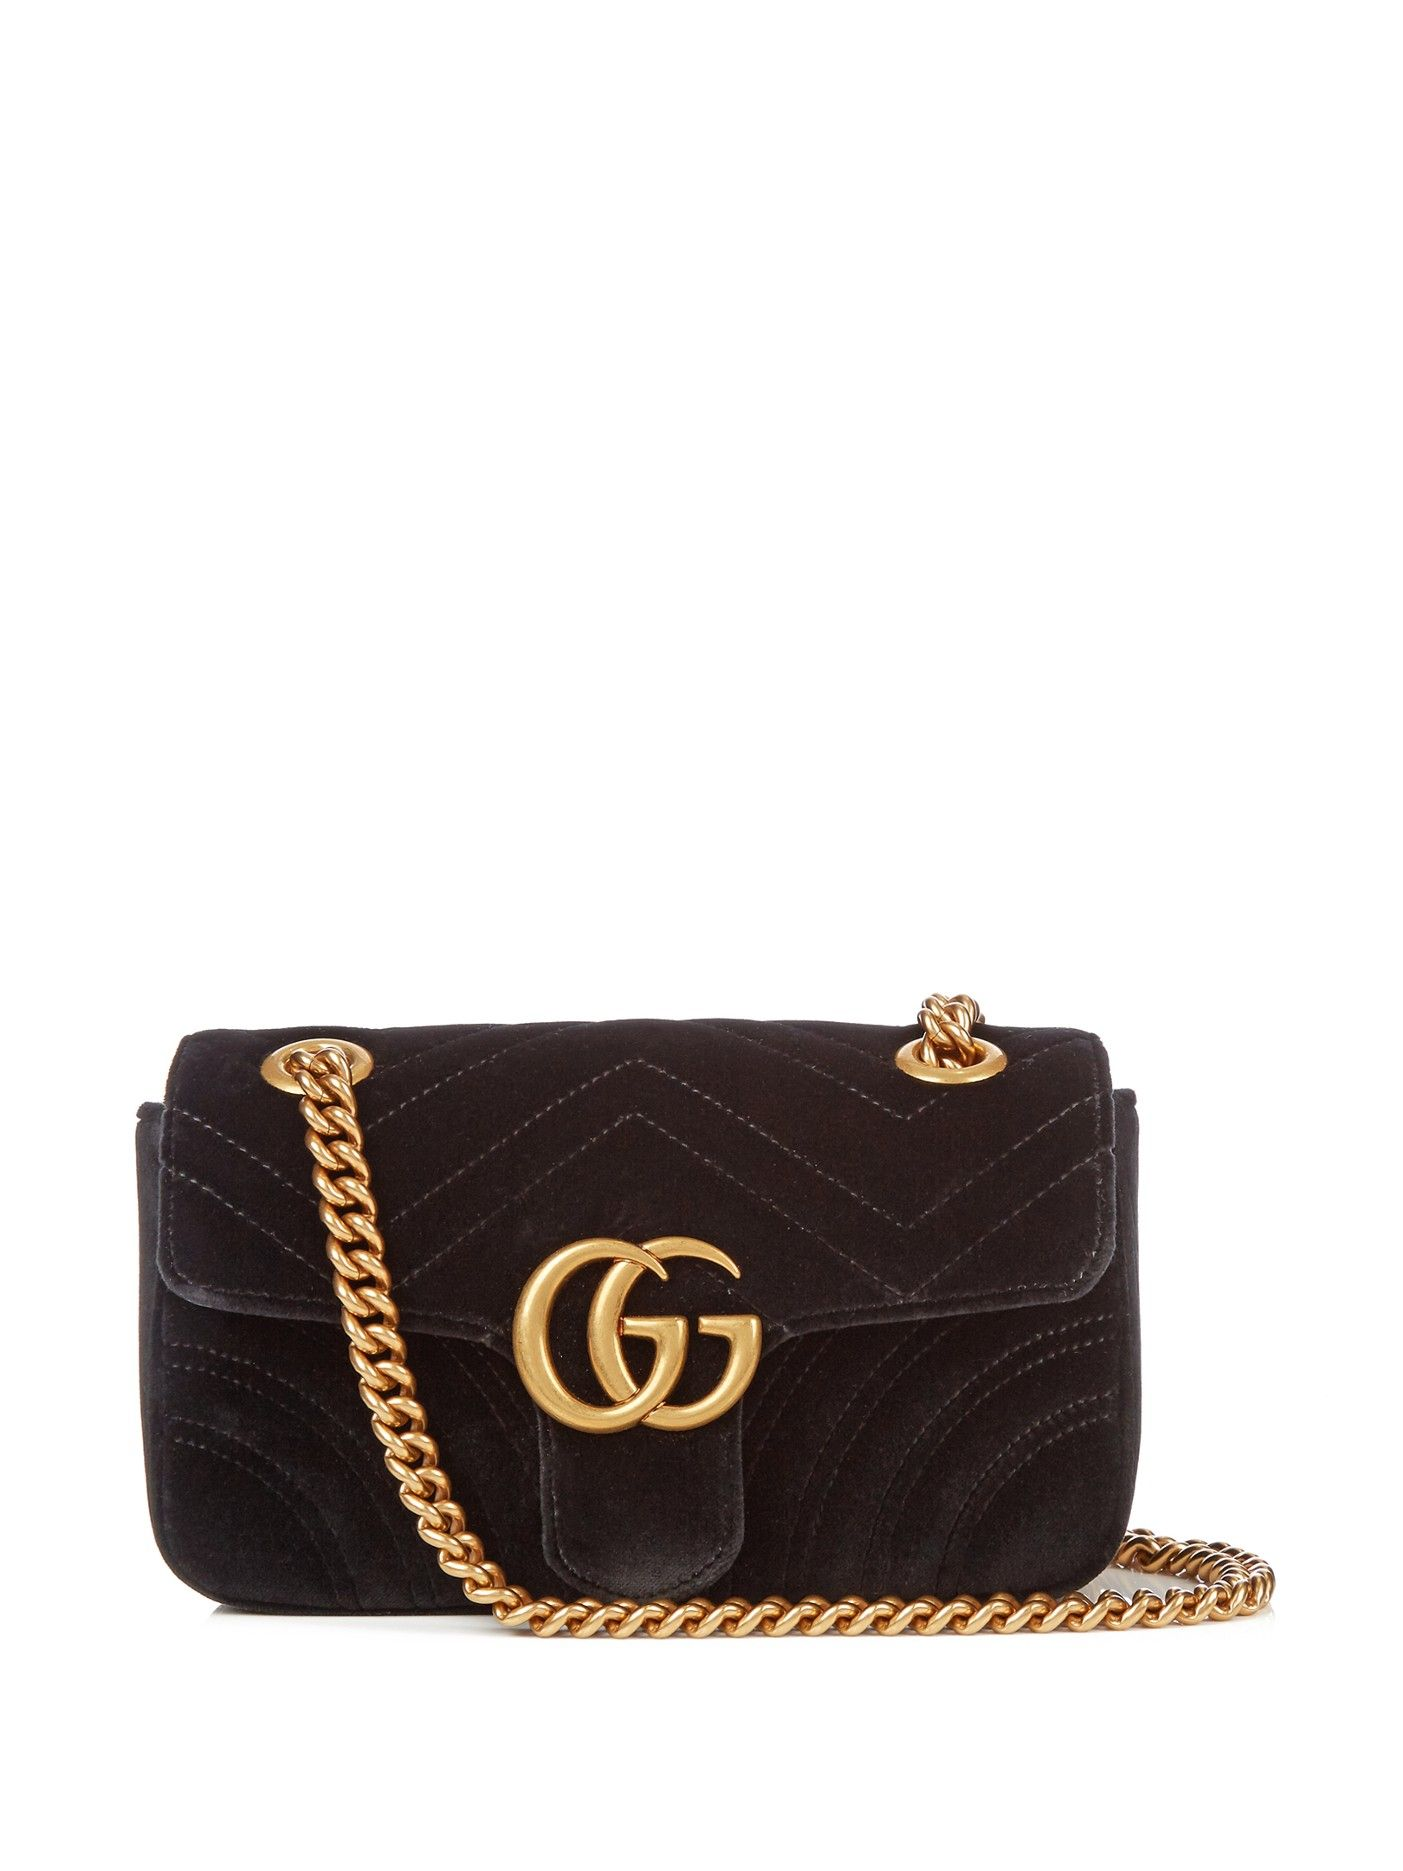 GG Marmont mini chevron-velvet cross-body bag   Gucci   MATCHESFASHION.COM US